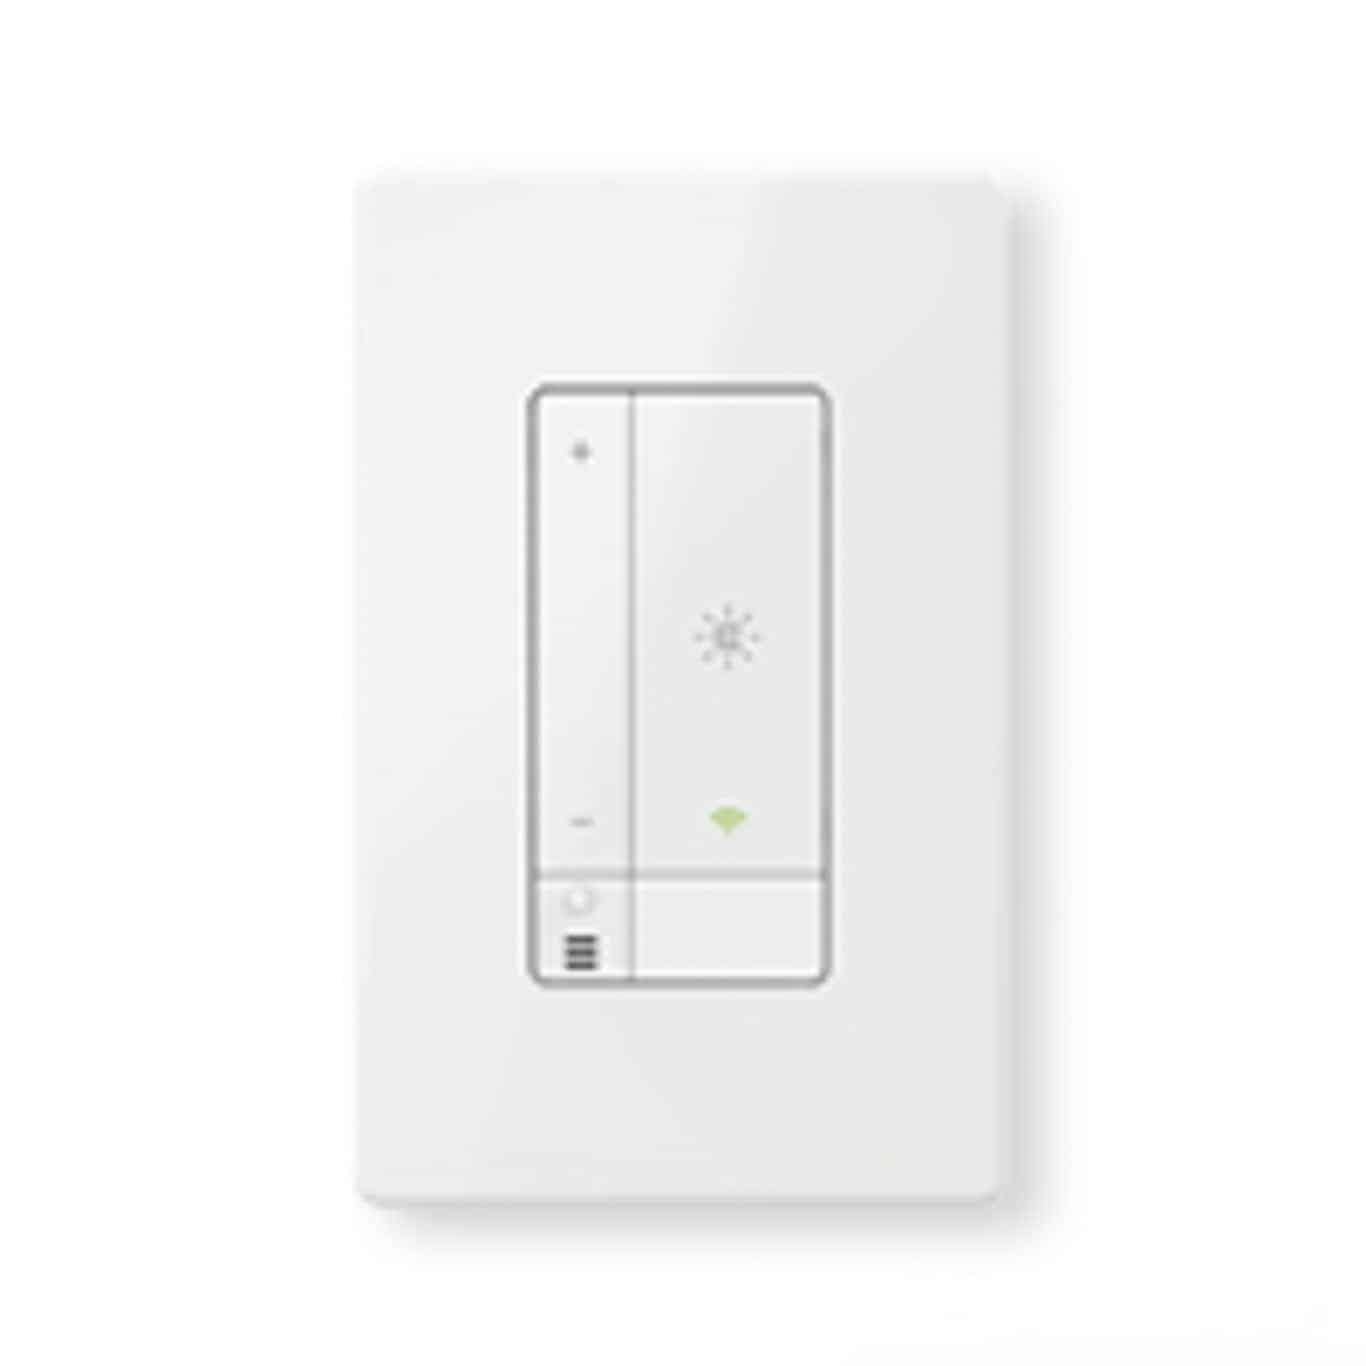 CbyGE Wall Switch